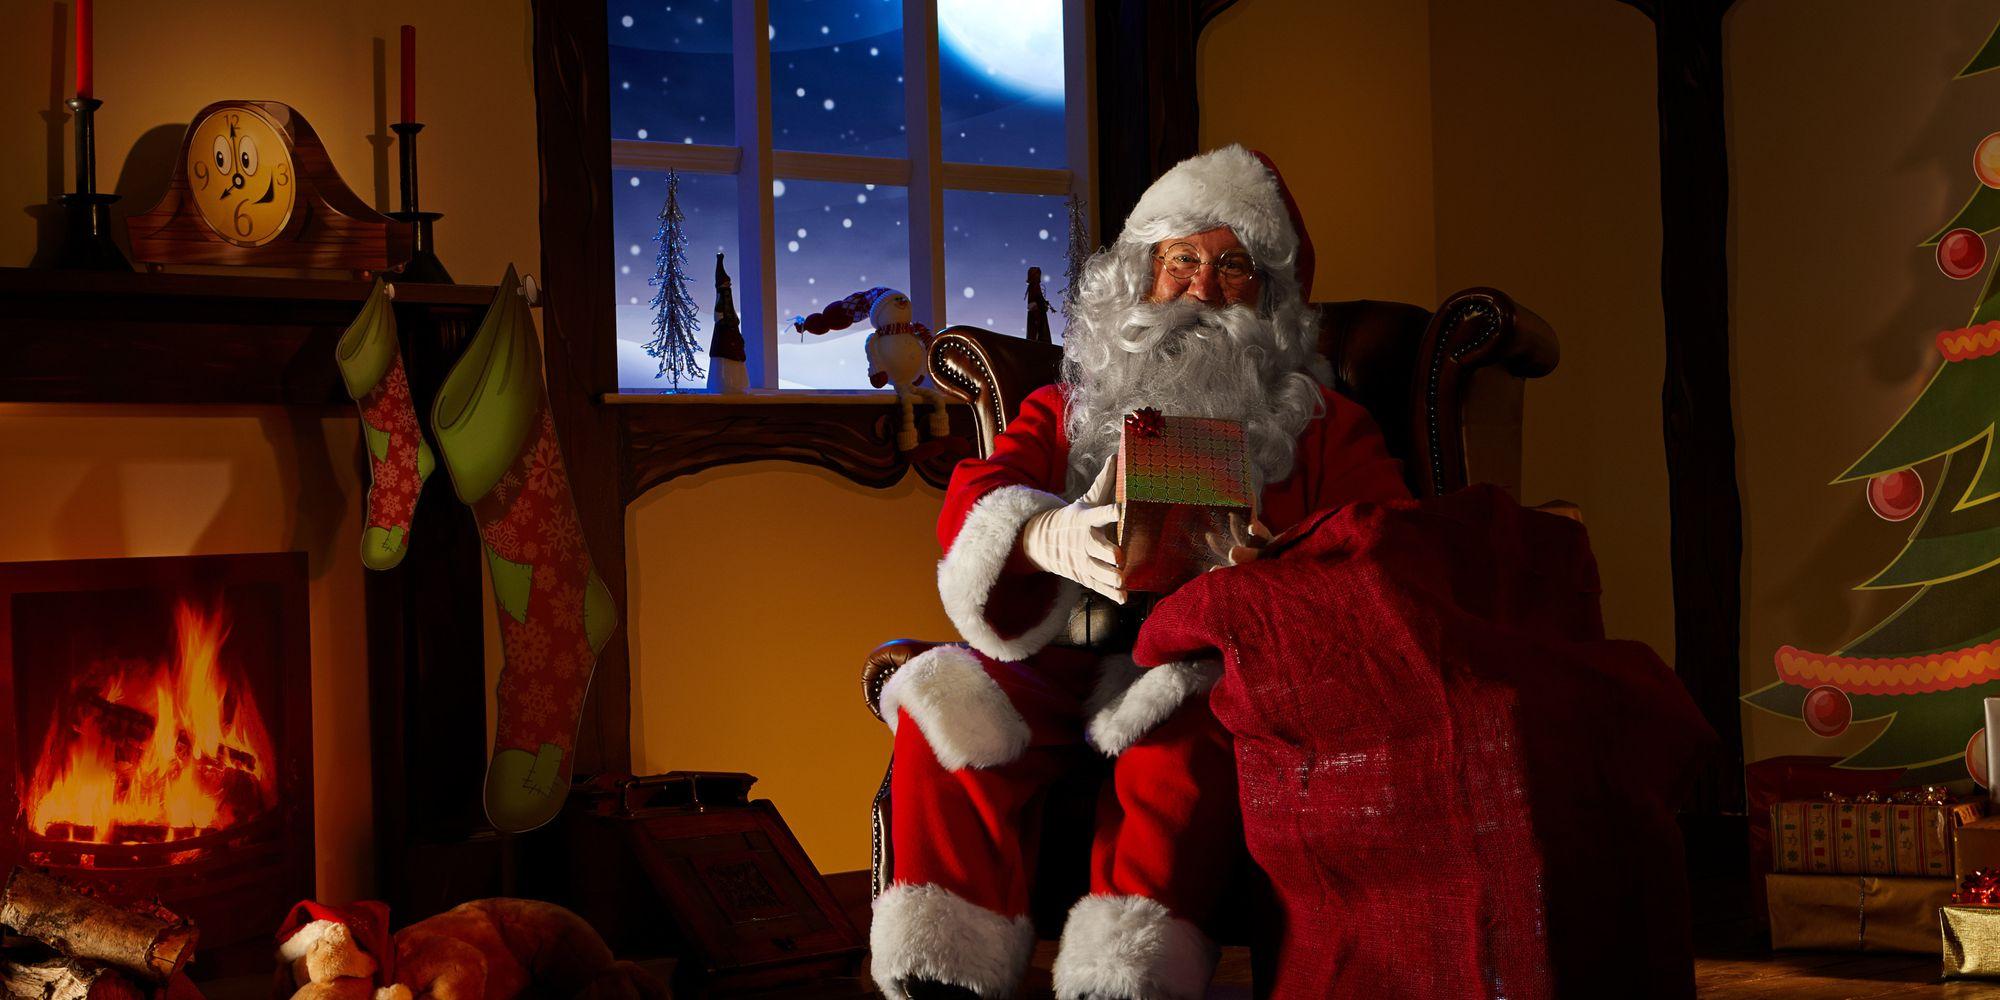 meeting father christmas hallmark movie